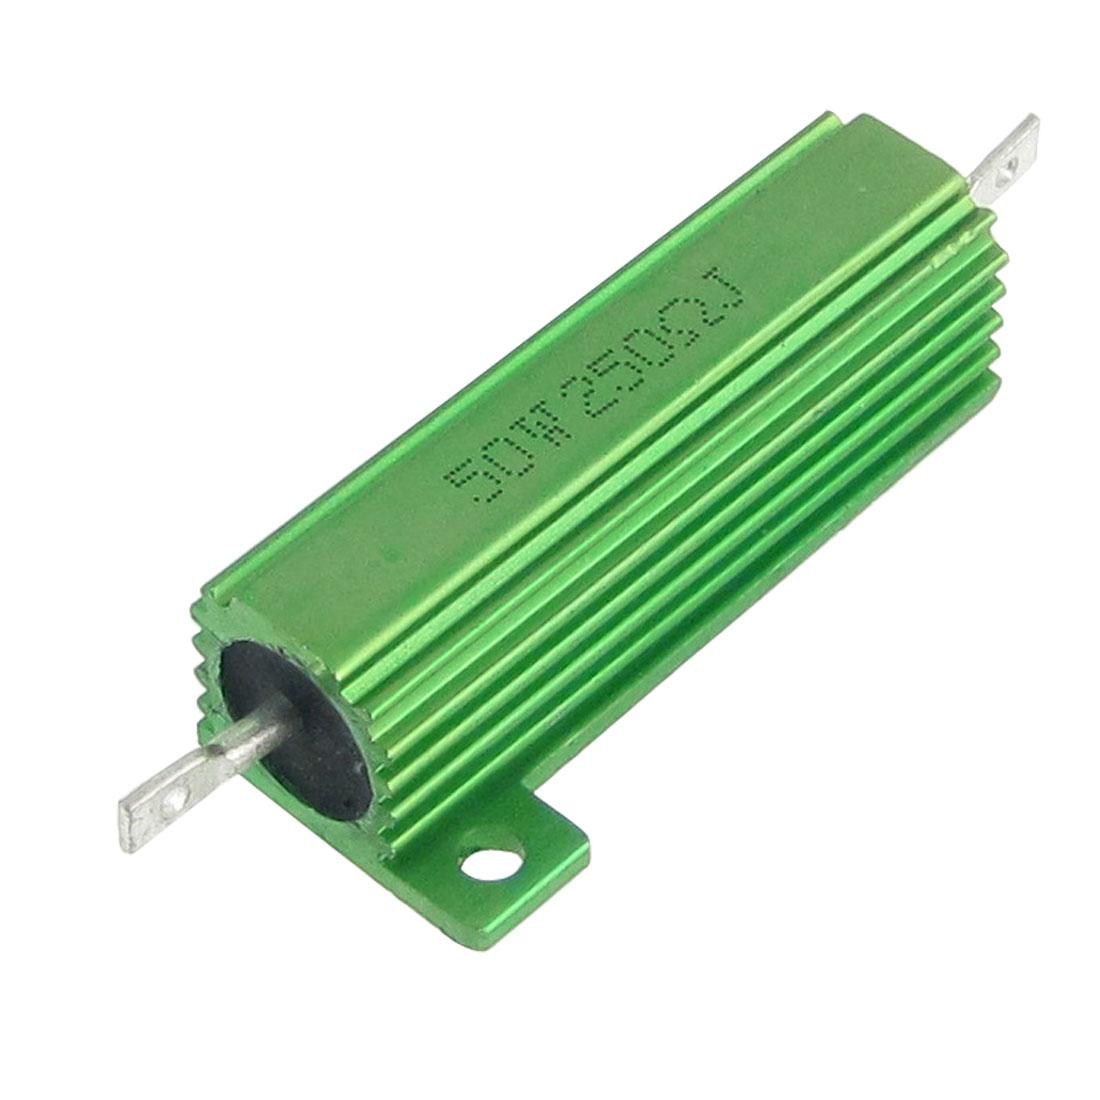 Green Aluminum Case Wire Wound 50W 5% 250 Ohm Resistors 2 Pcs - image 1 of 1